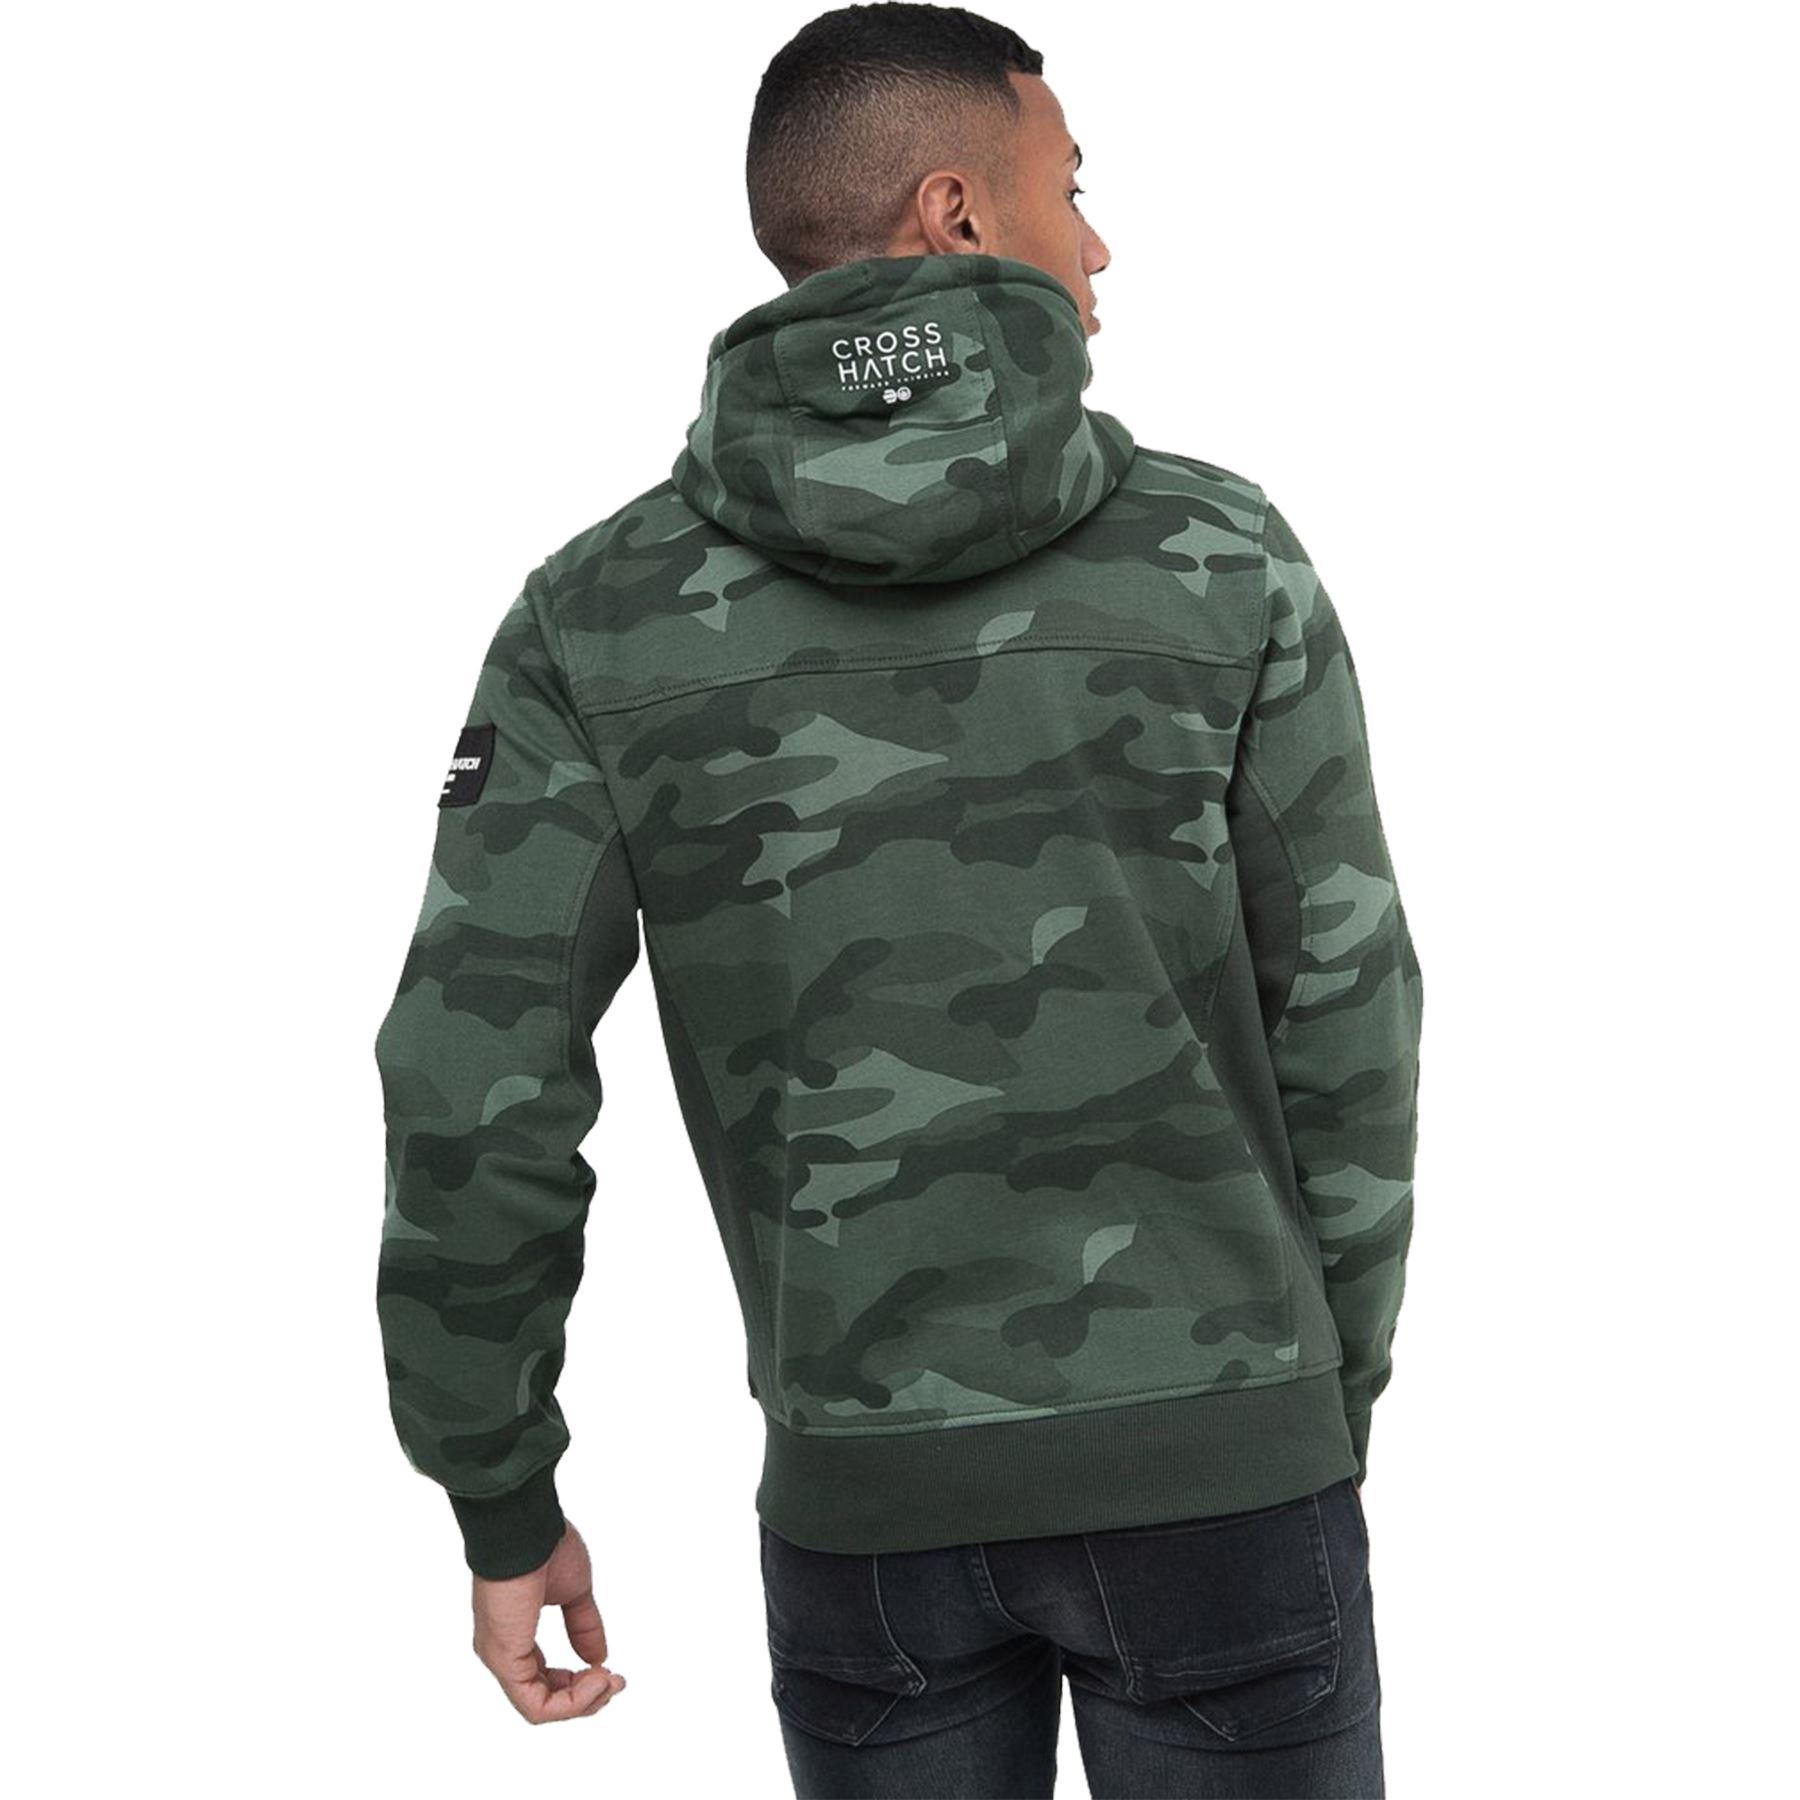 Crosshatch-Mens-Camo-Hoodie-Designer-Army-Style-Jacket-Zip-Thru-Pocket-Jacket thumbnail 6